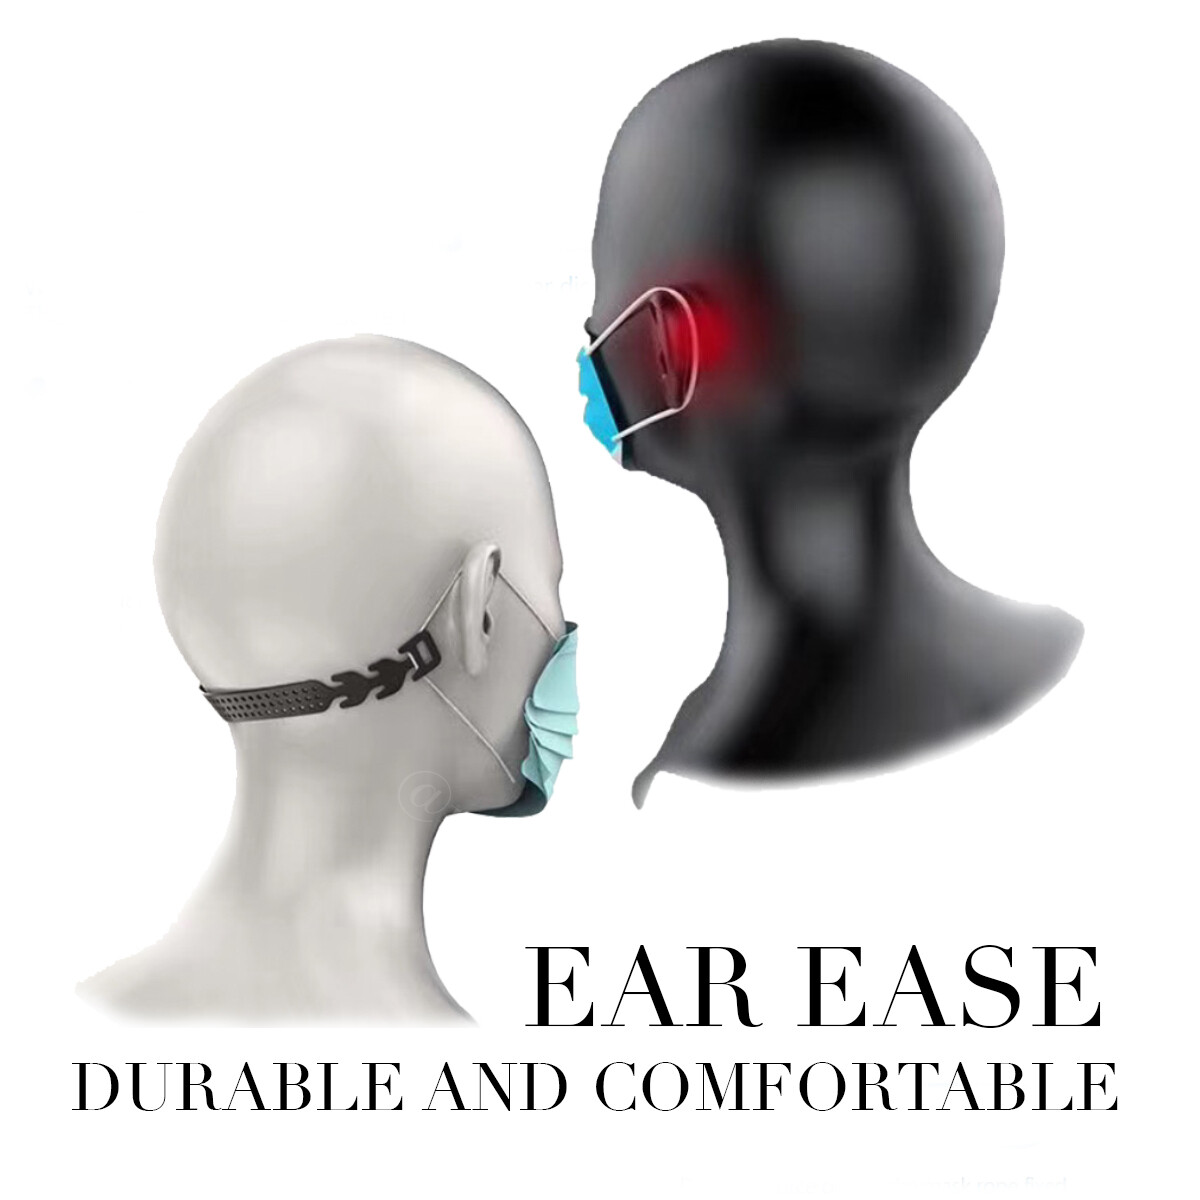 EAR EASE (BLACK COLOR ONLY)